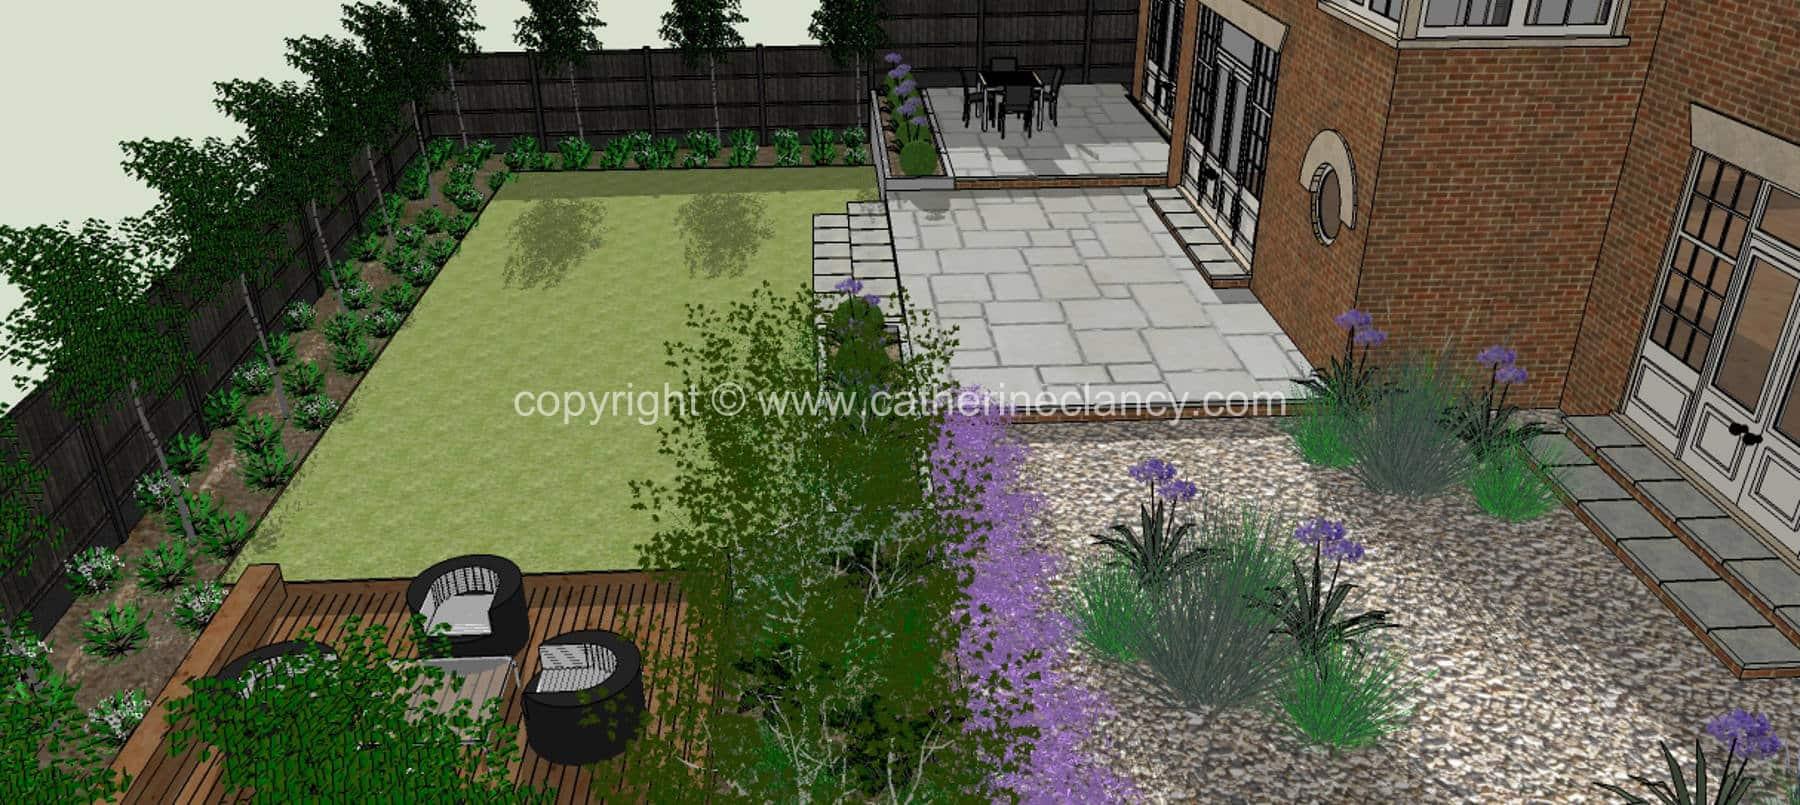 hendon-grand-design-garden-5